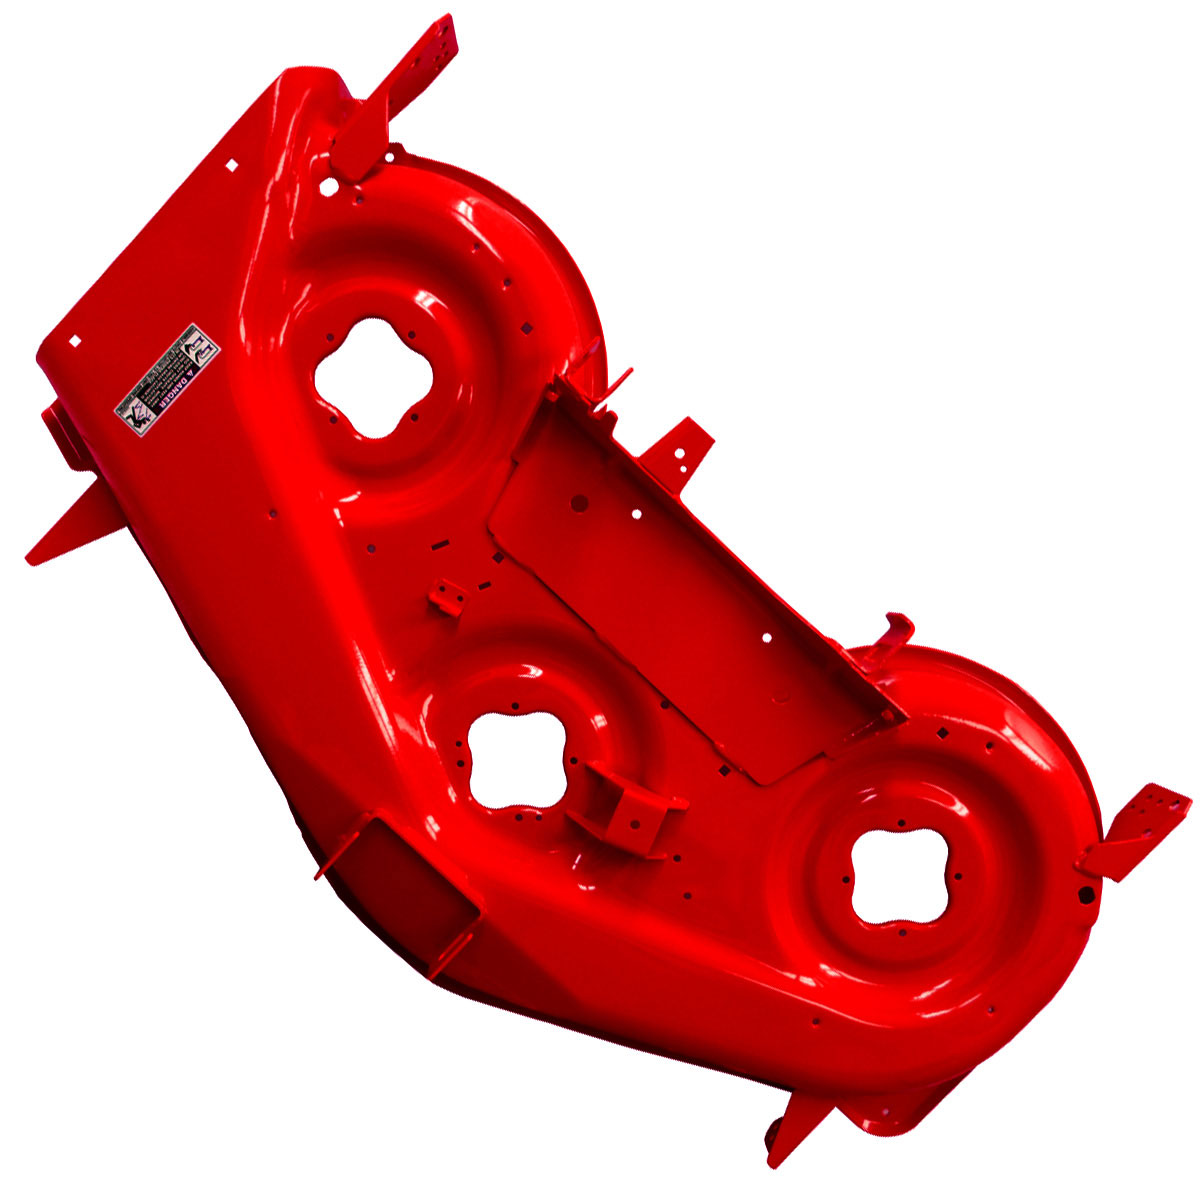 Cub Cadet Deck Shell 903 04328c 0638 Power Mower Sales